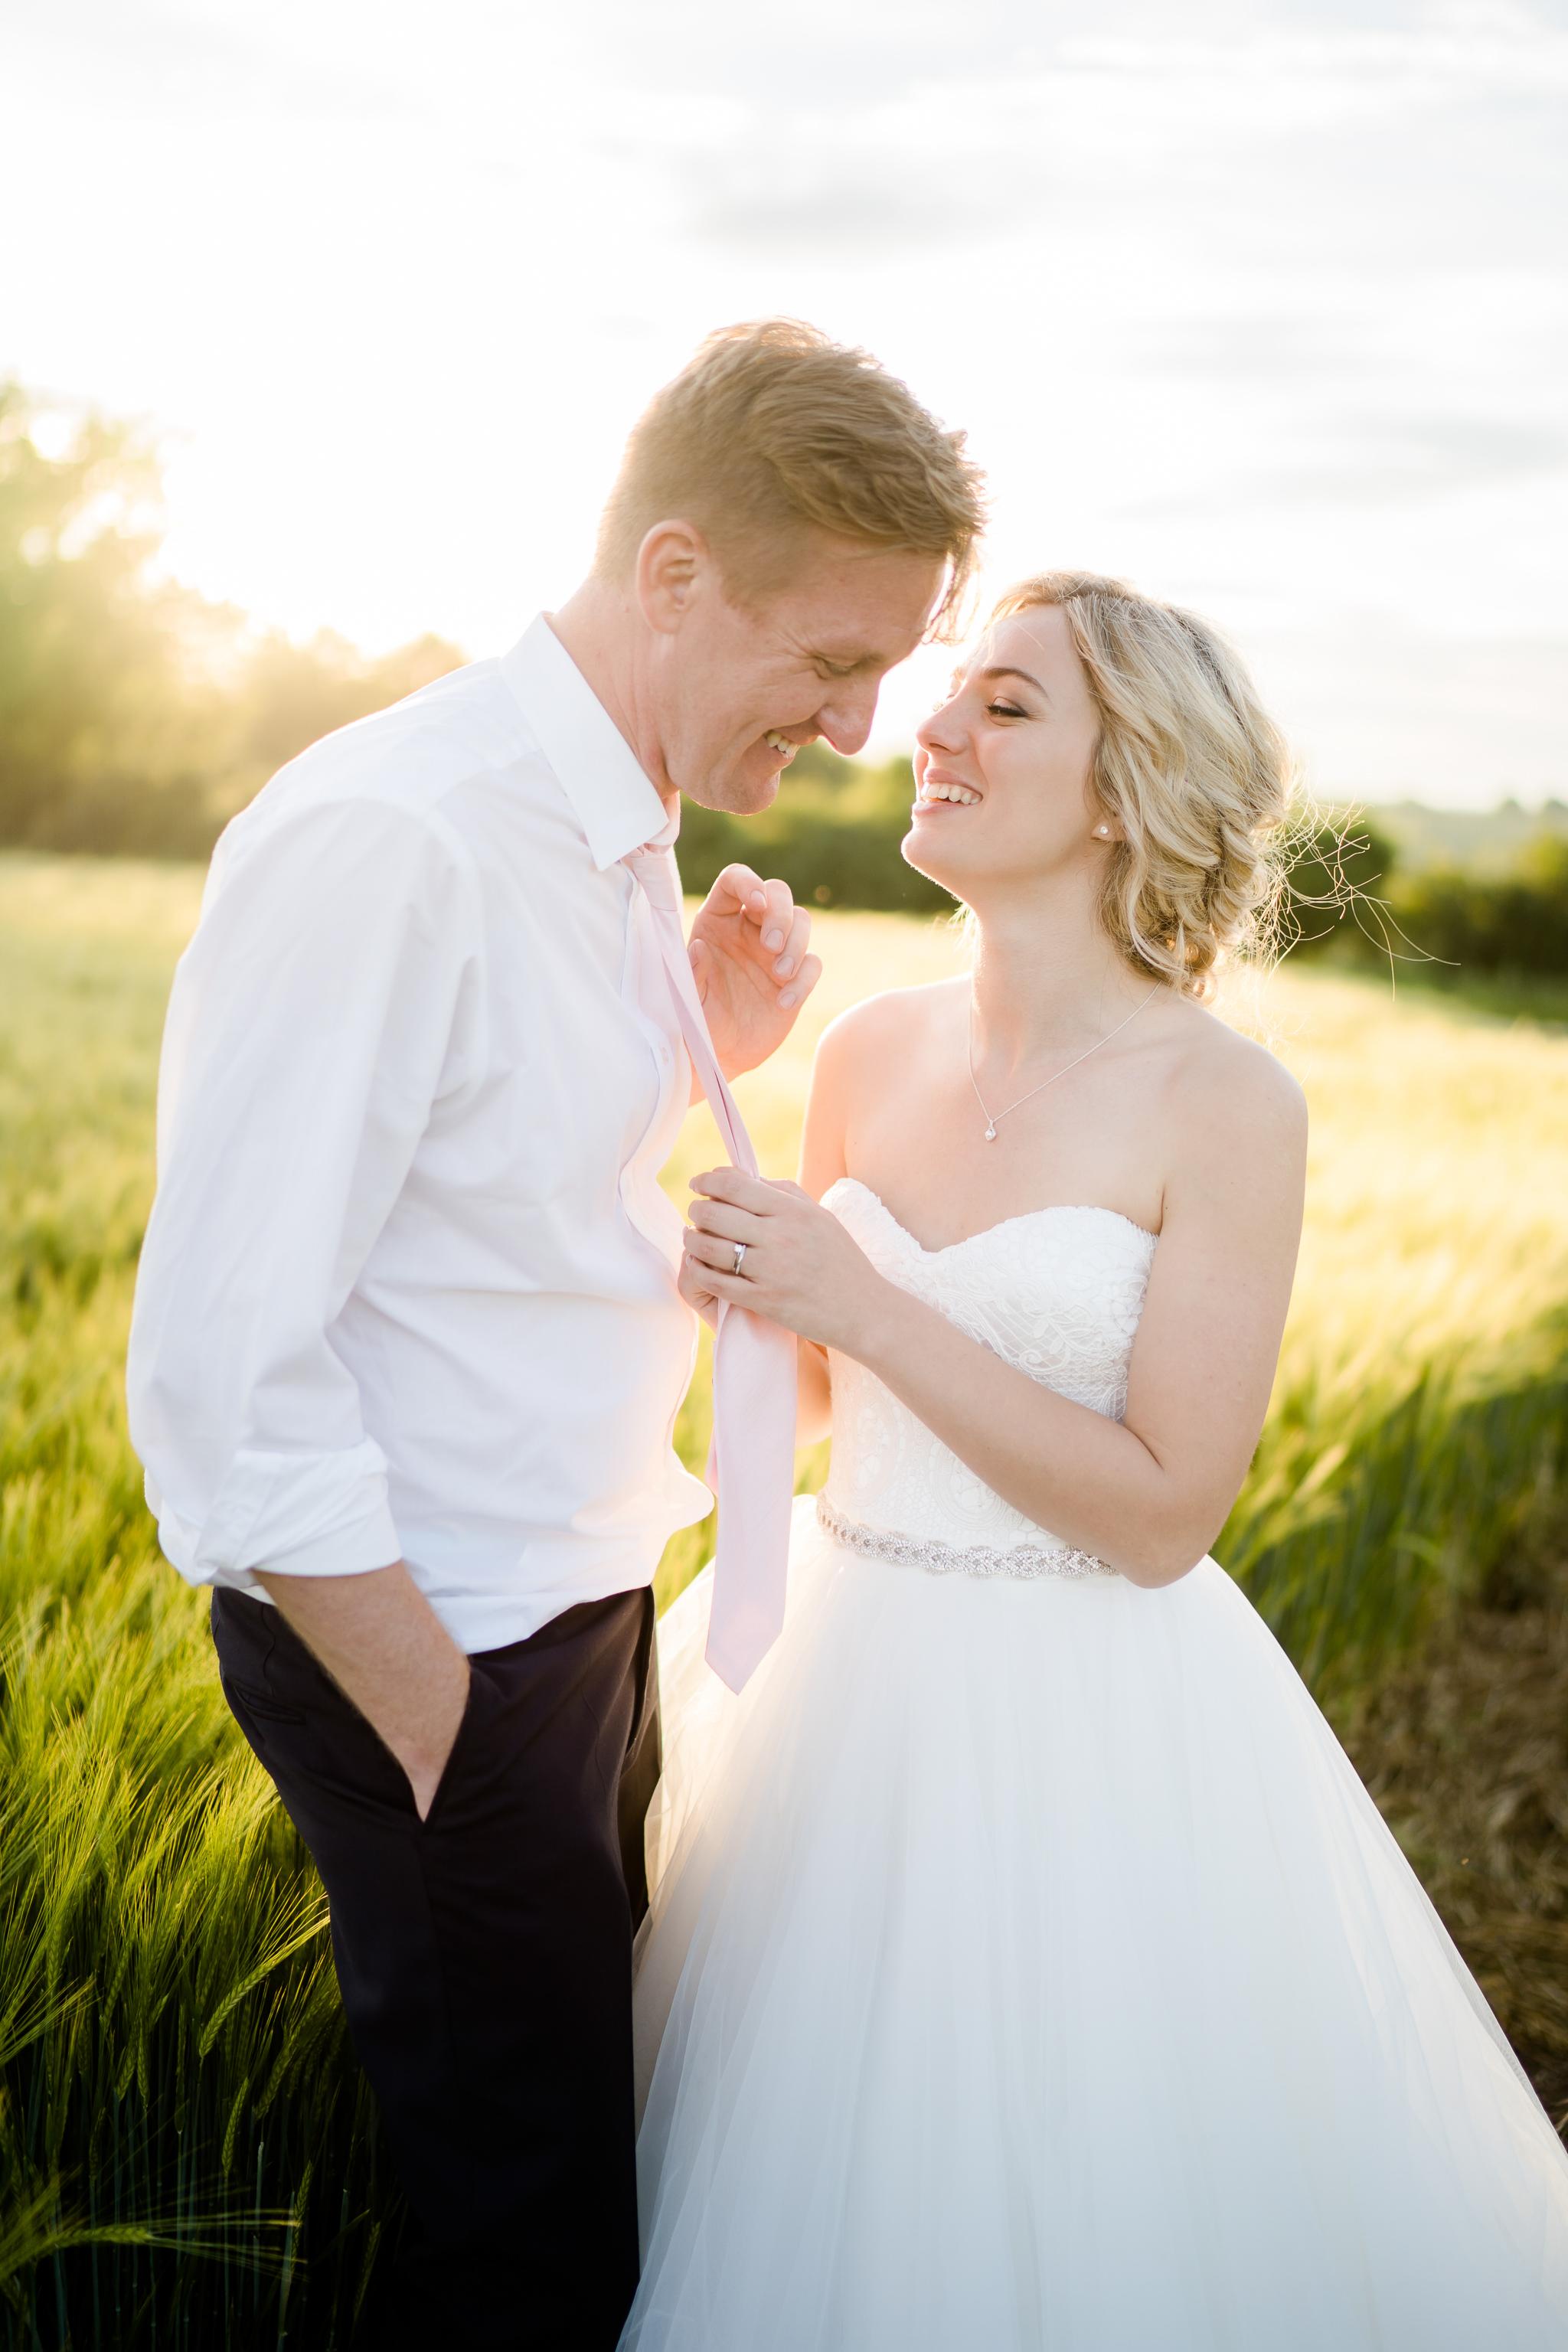 wild undone rustic wedding bouquet in pastel colours by Jenni Bloom Flowers